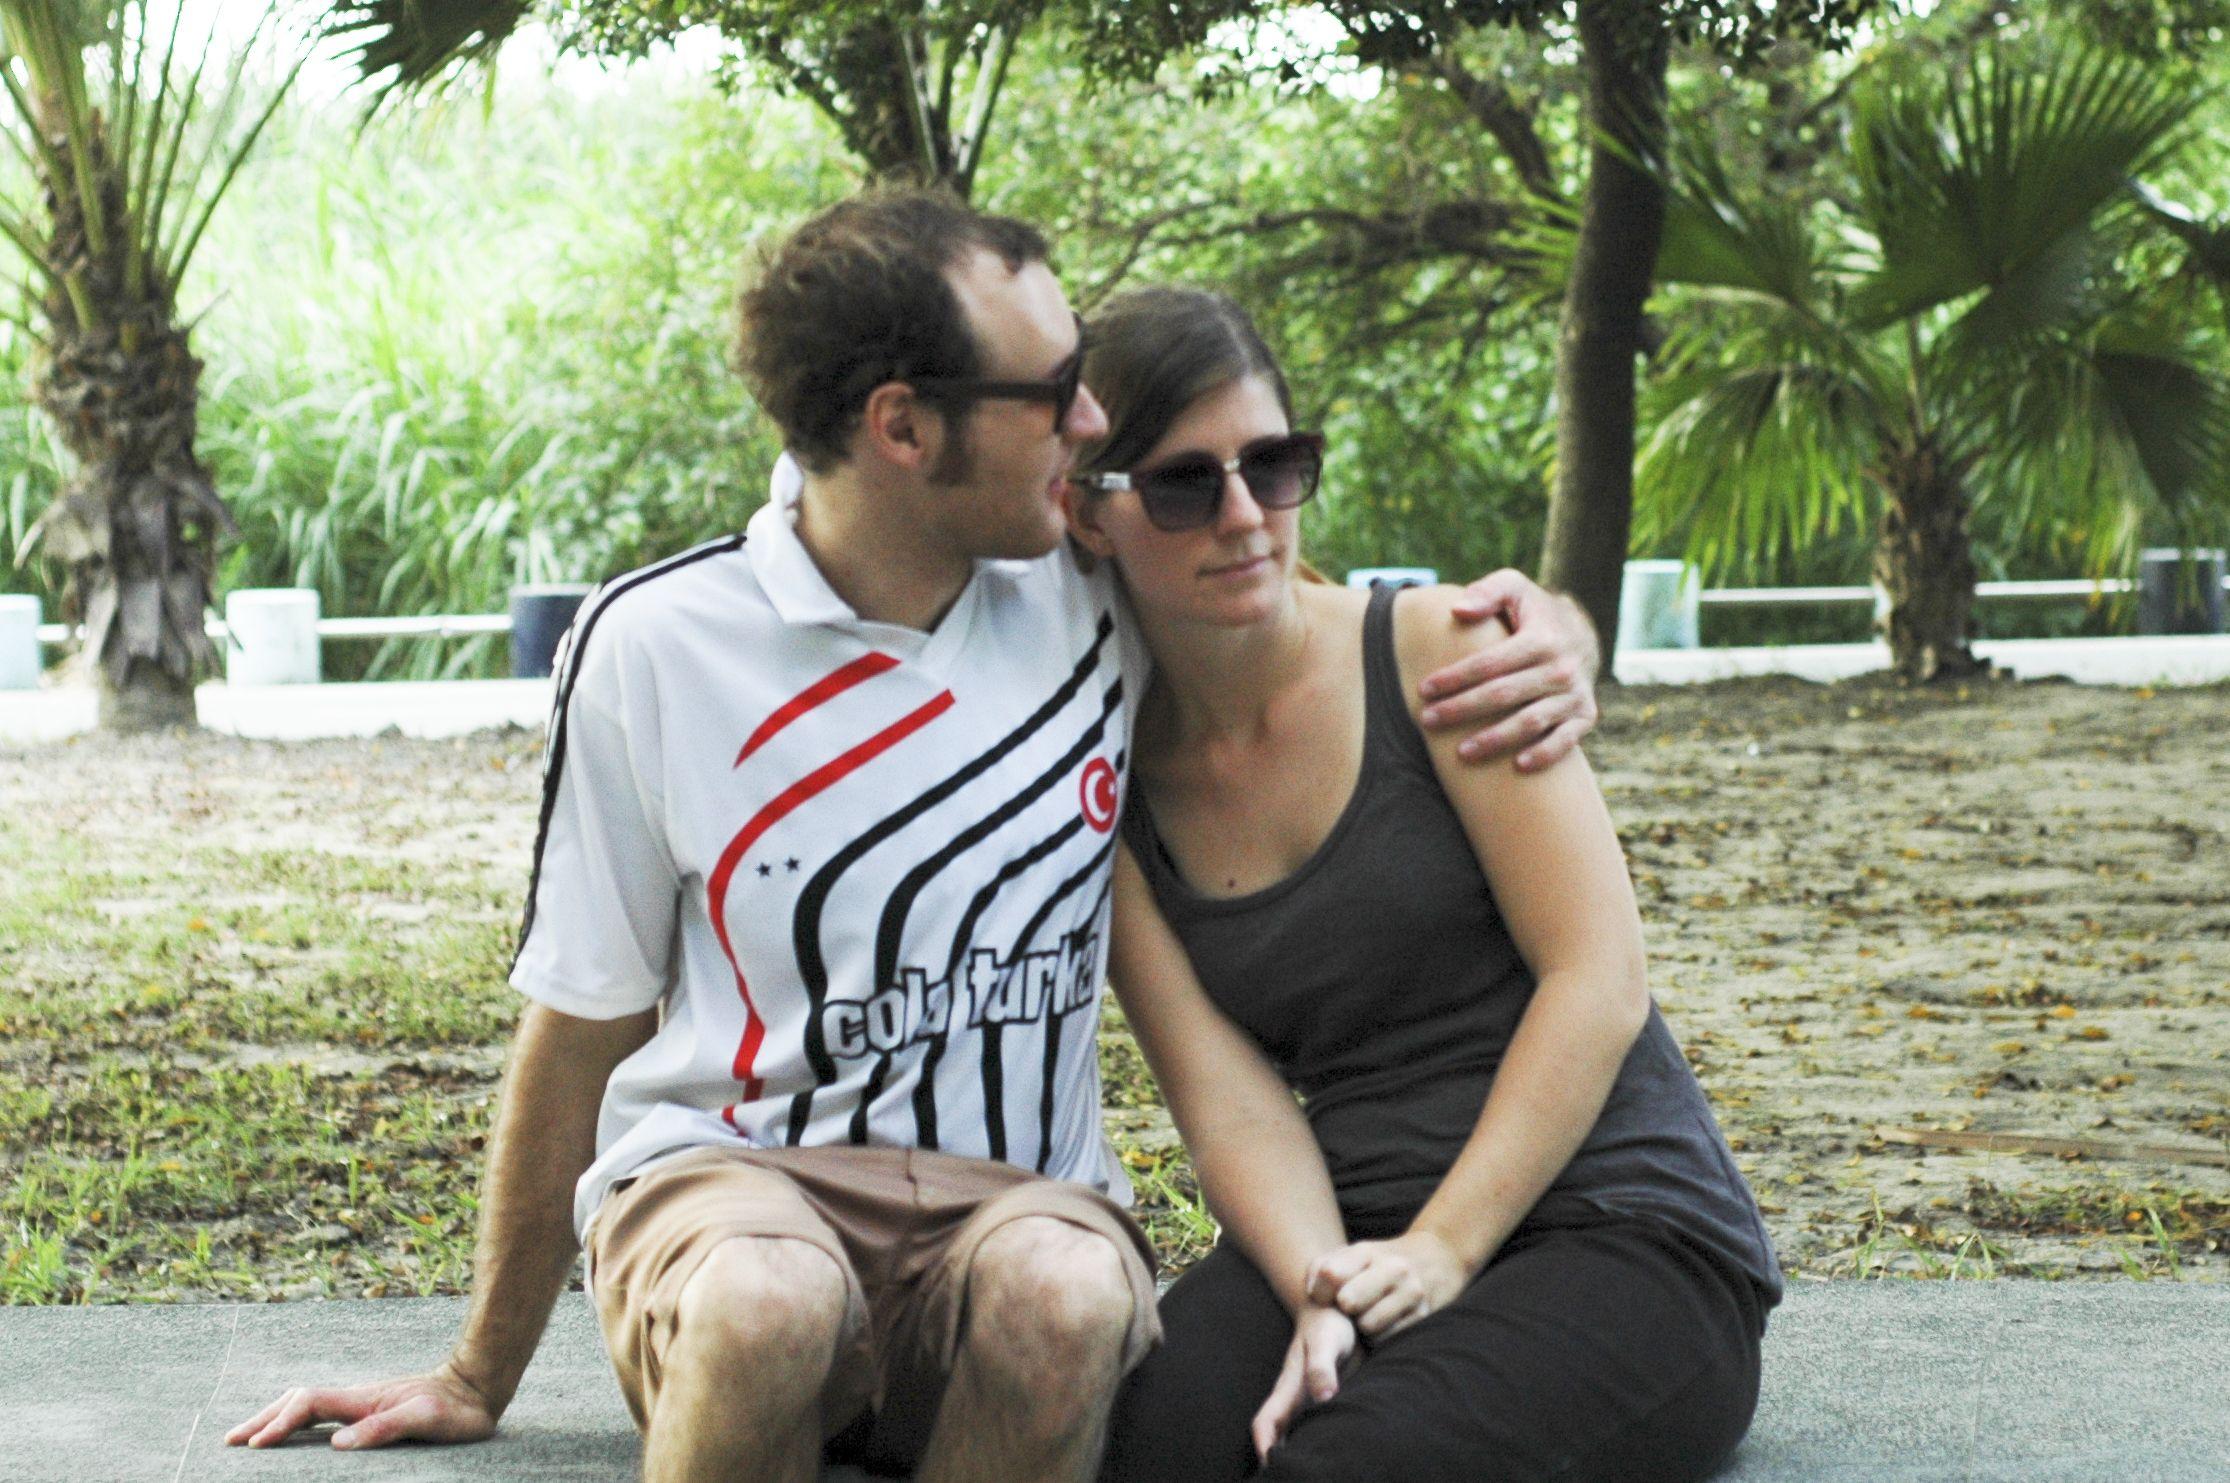 Ontario dating site arvostelua